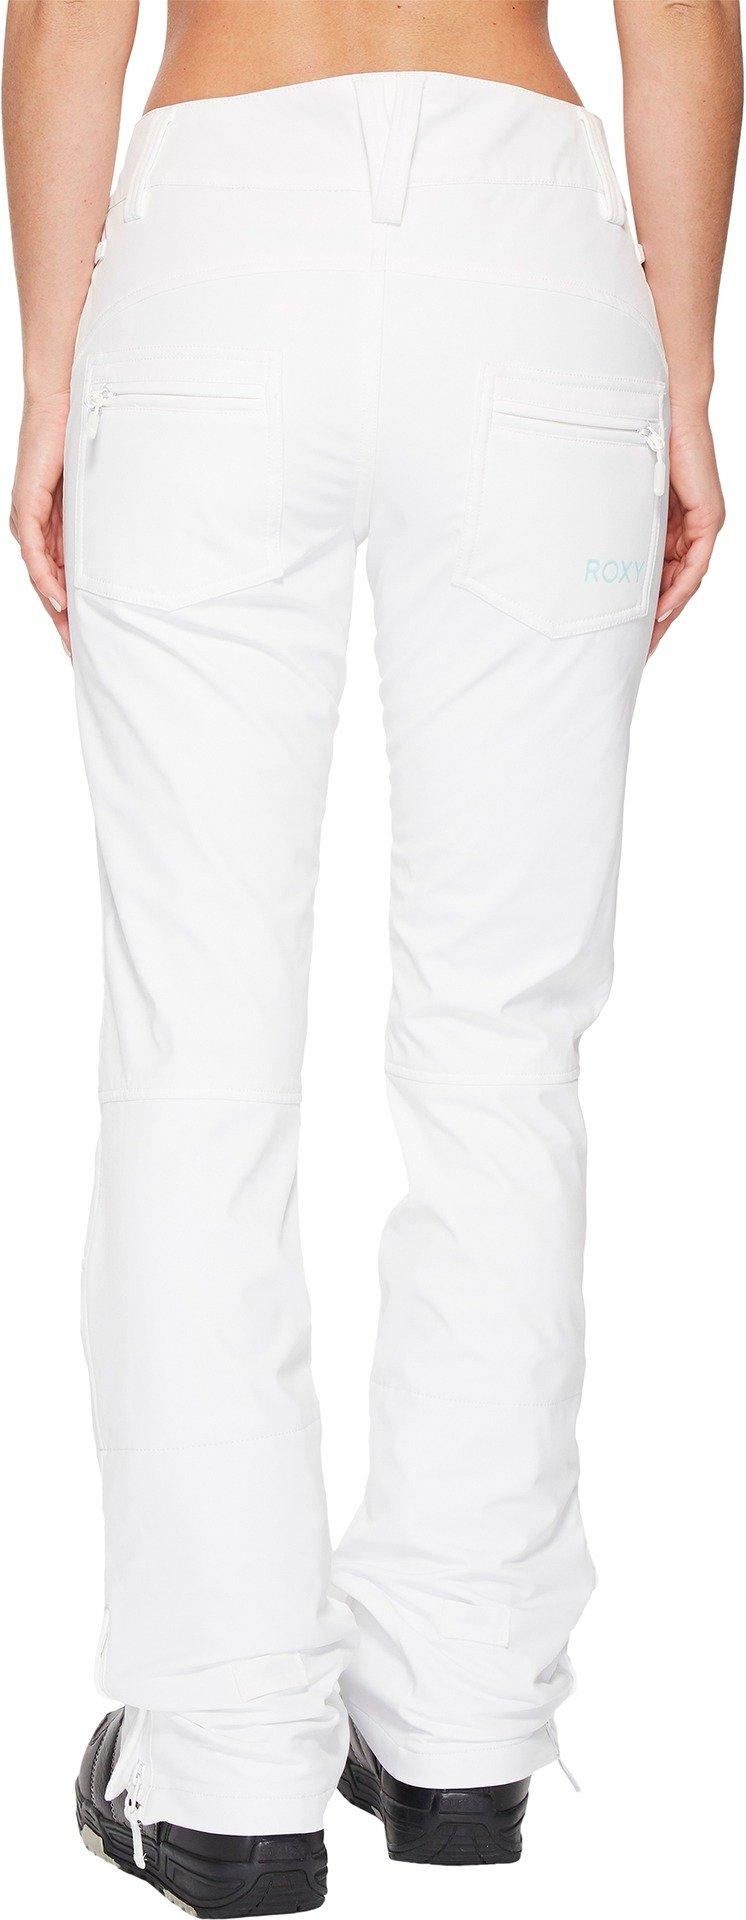 Roxy Snow Junior's Creek Snow Pant, Bright White New, XL by Roxy (Image #3)